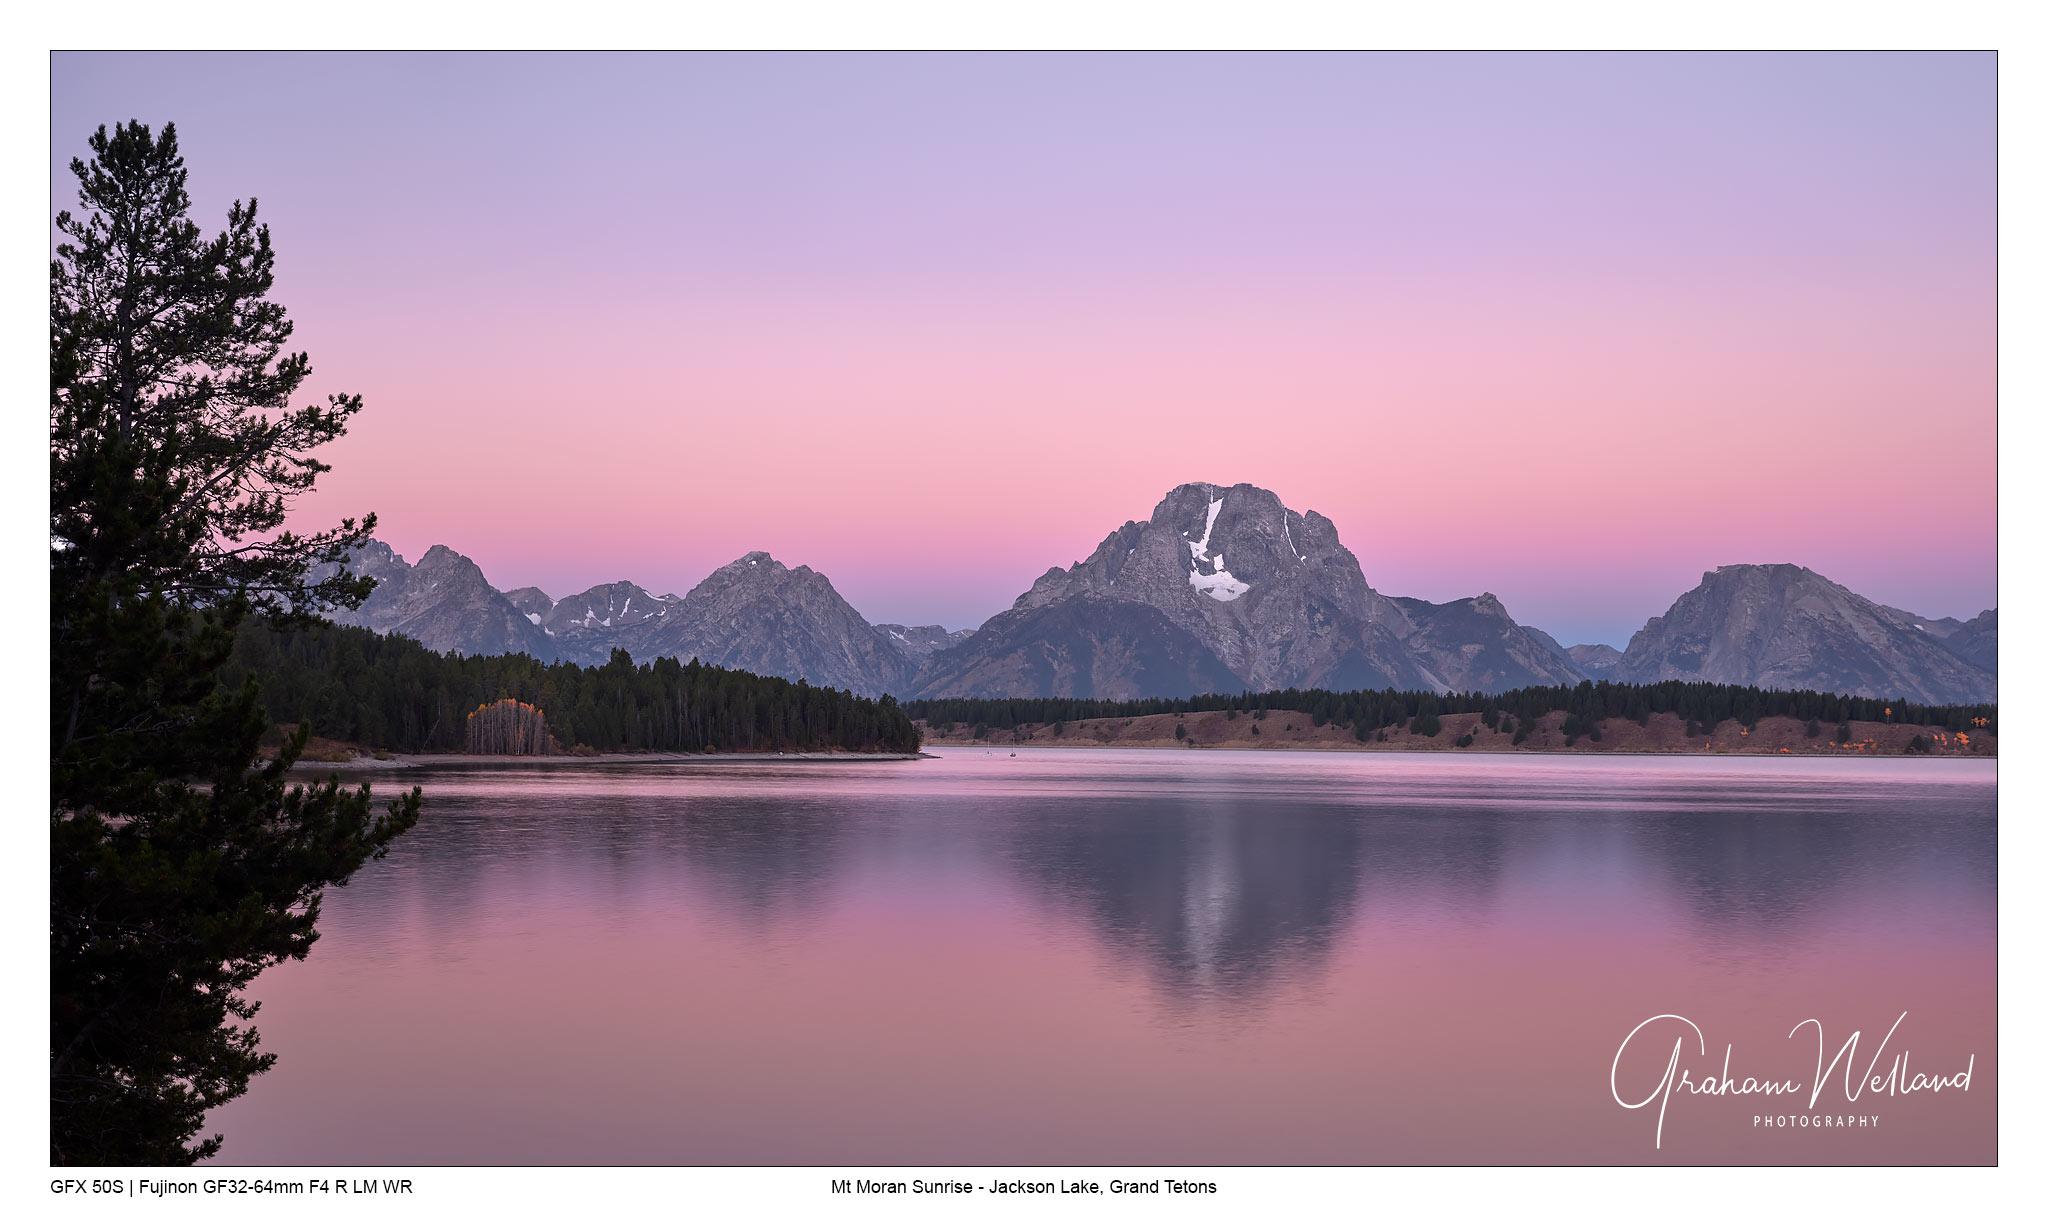 Mt Moran over Jackson Lake Sunrise by GrahamWelland in GrahamWelland